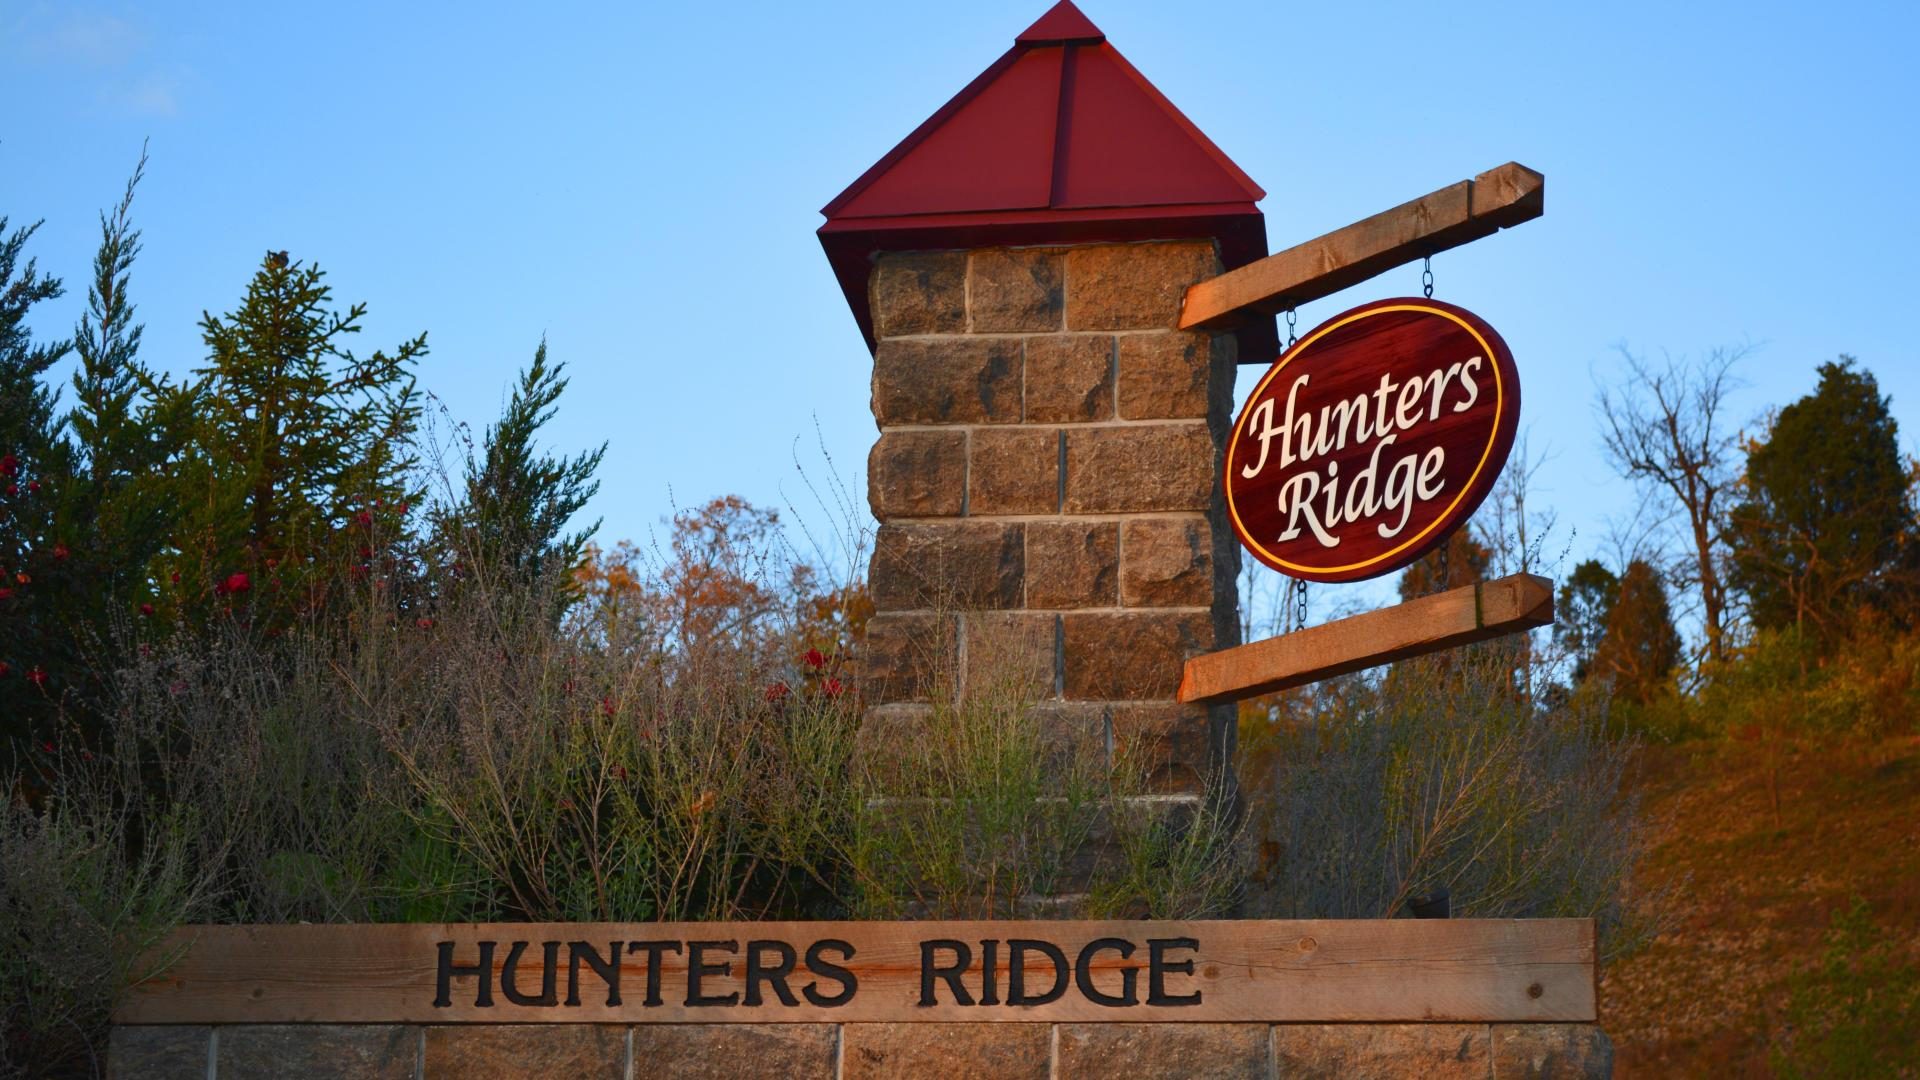 Hunters Ridge,45247